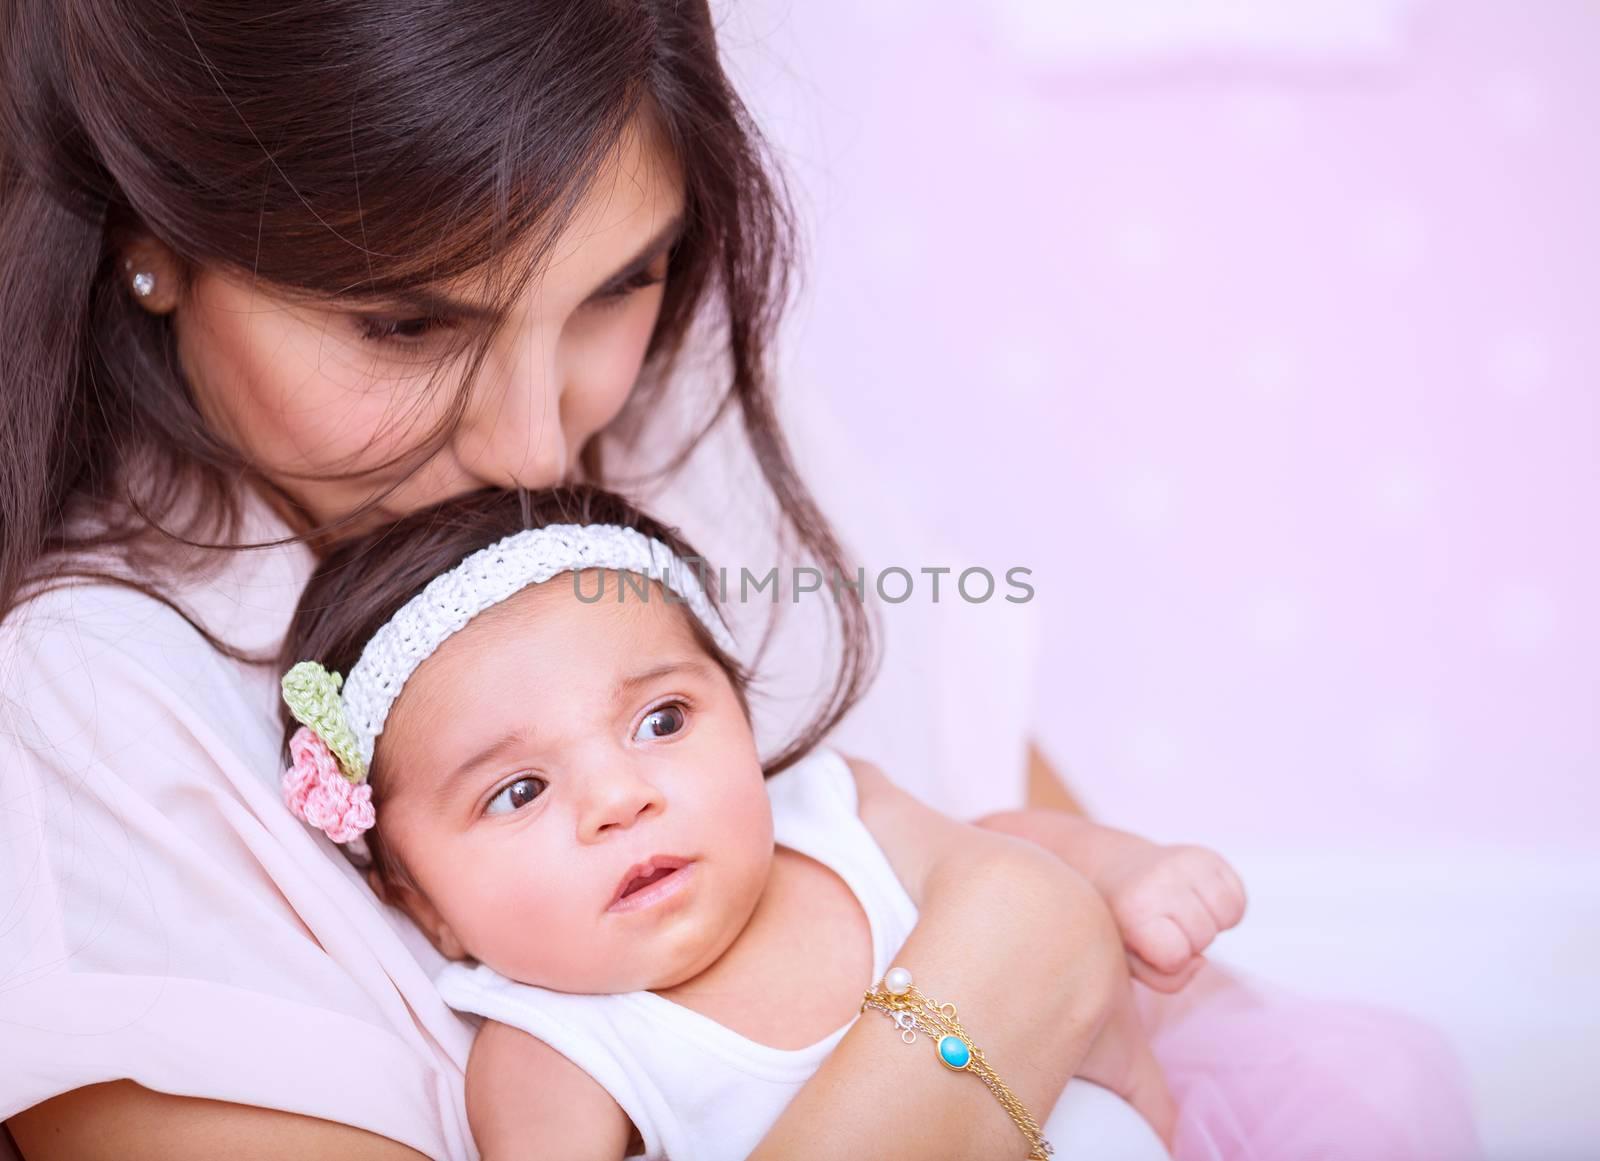 Closeup portrait of beautiful woman with gentleness kissing her cute newborn daughter, enjoying parenthood, mother's love concept